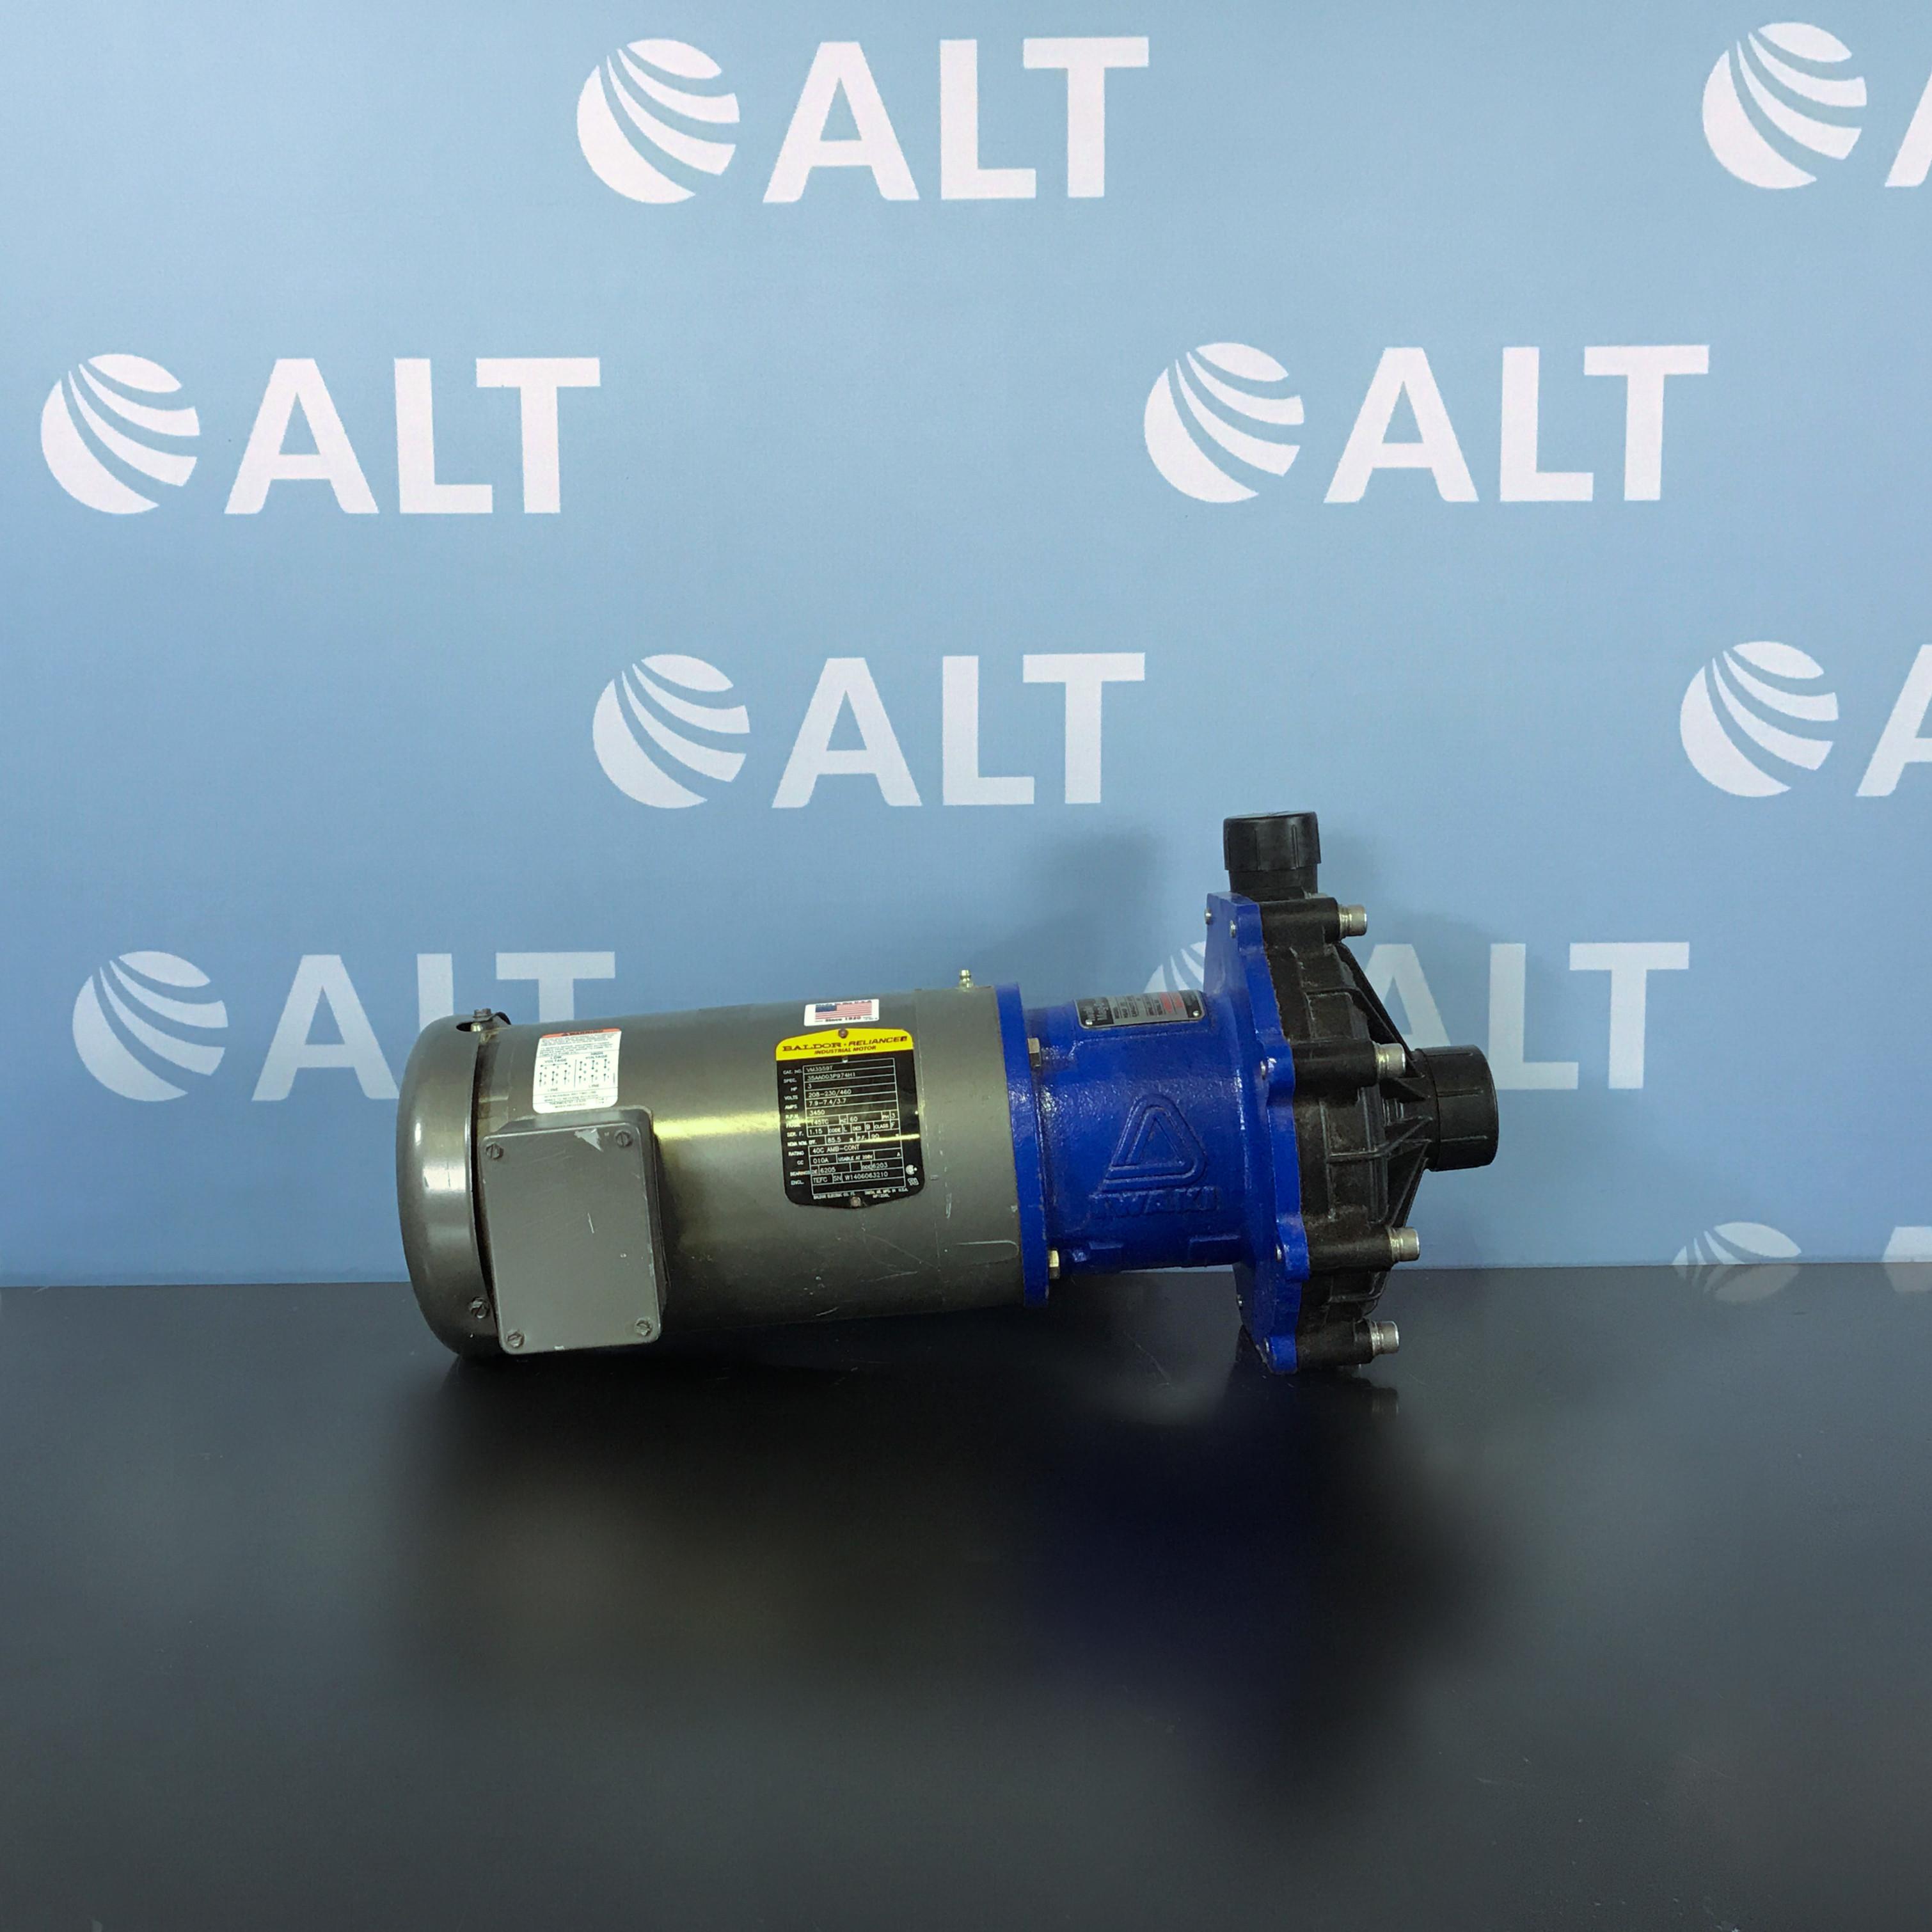 Iwaki America MX-403HCV6 Magnetic Drive Pump with Baldor VM3559T Motor Image